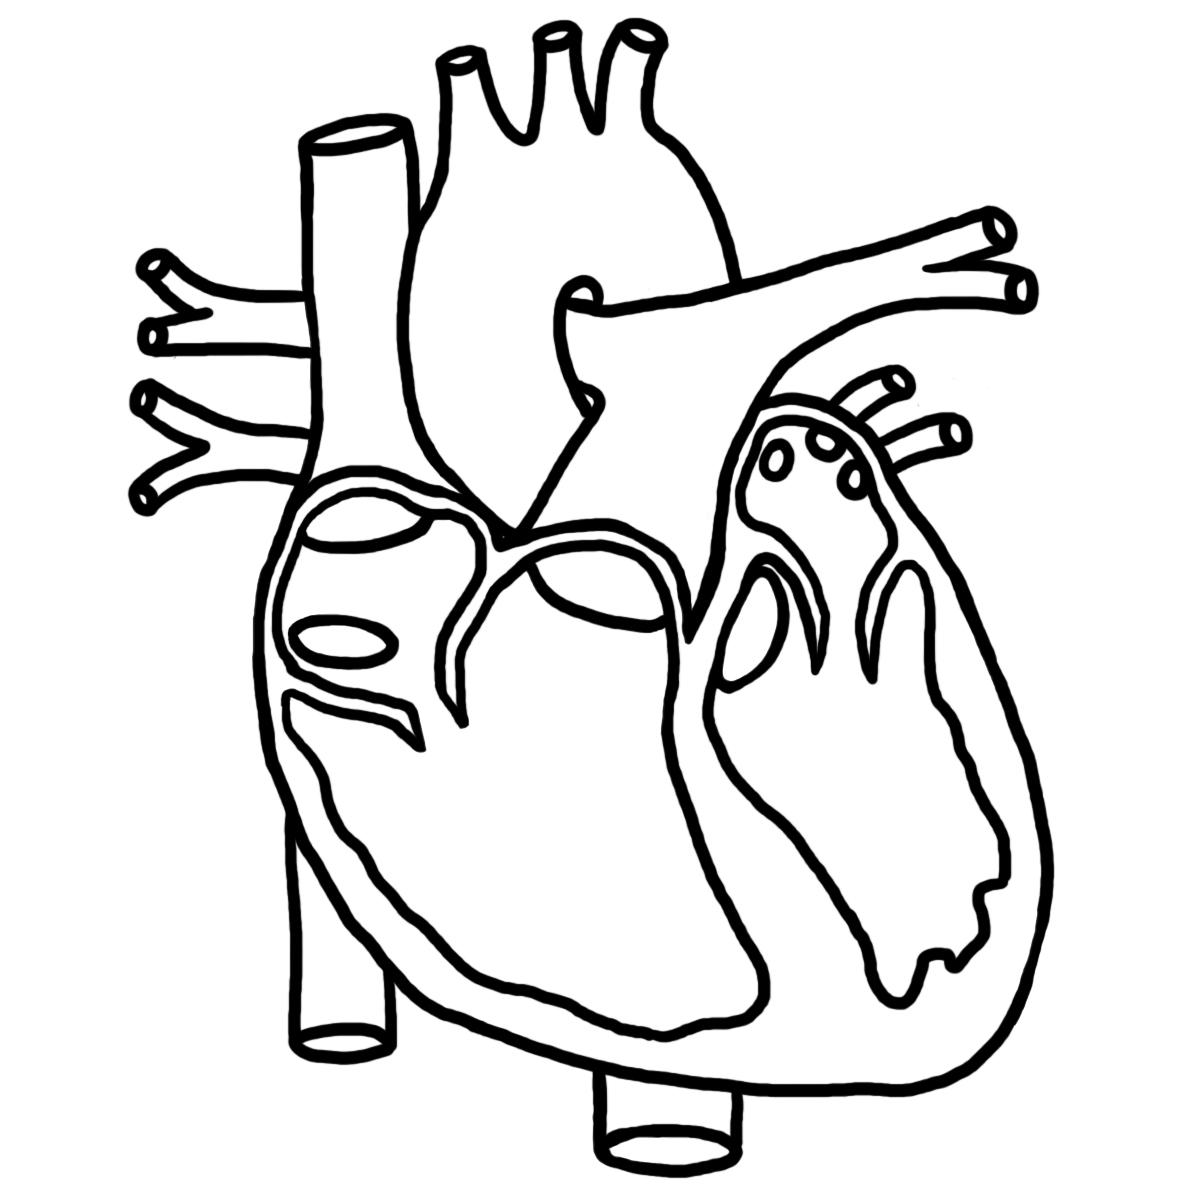 Unlabeled Heart Diagram.